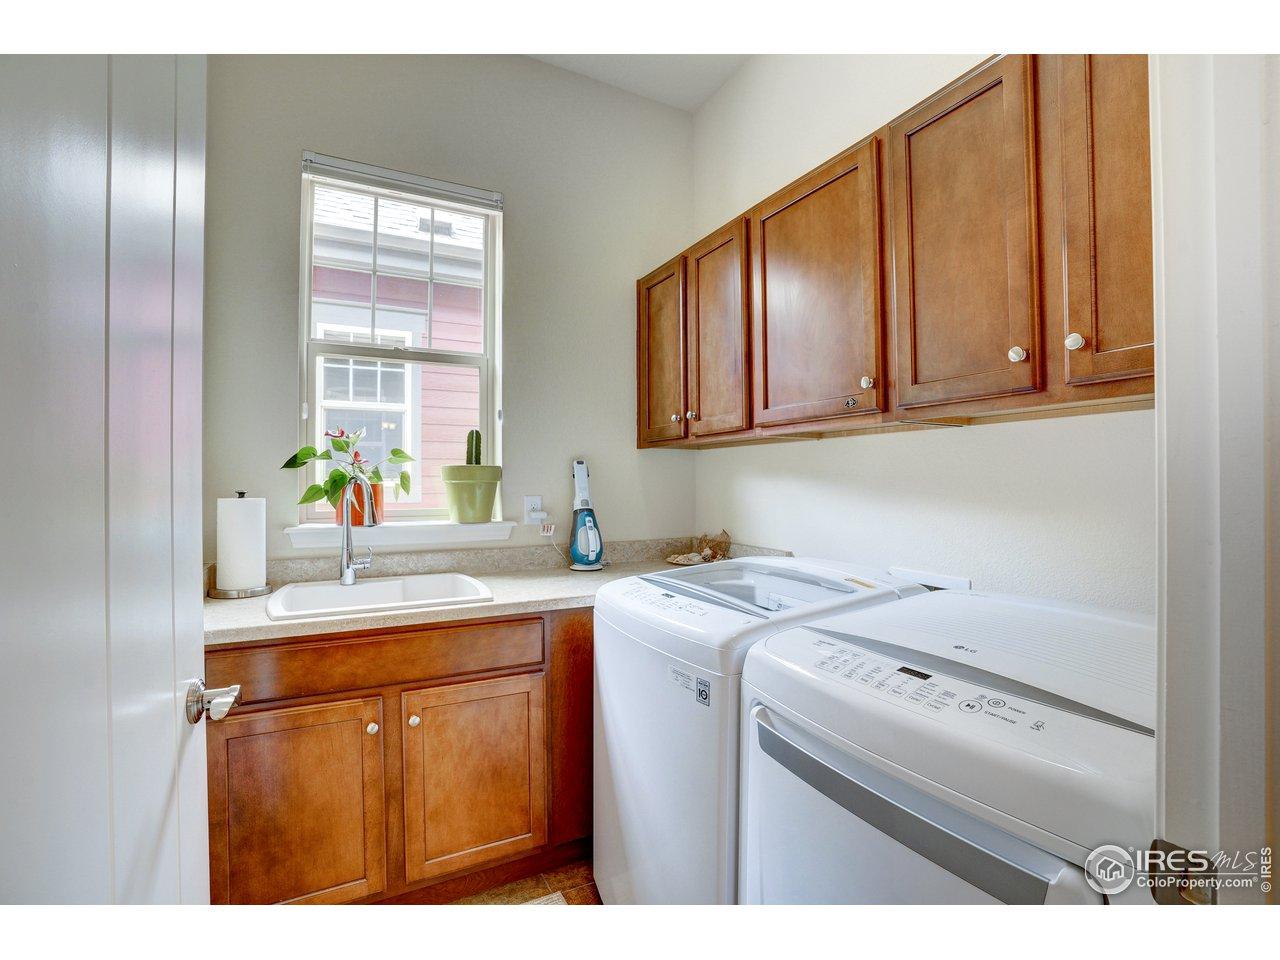 Main floor laundry room with deep sink